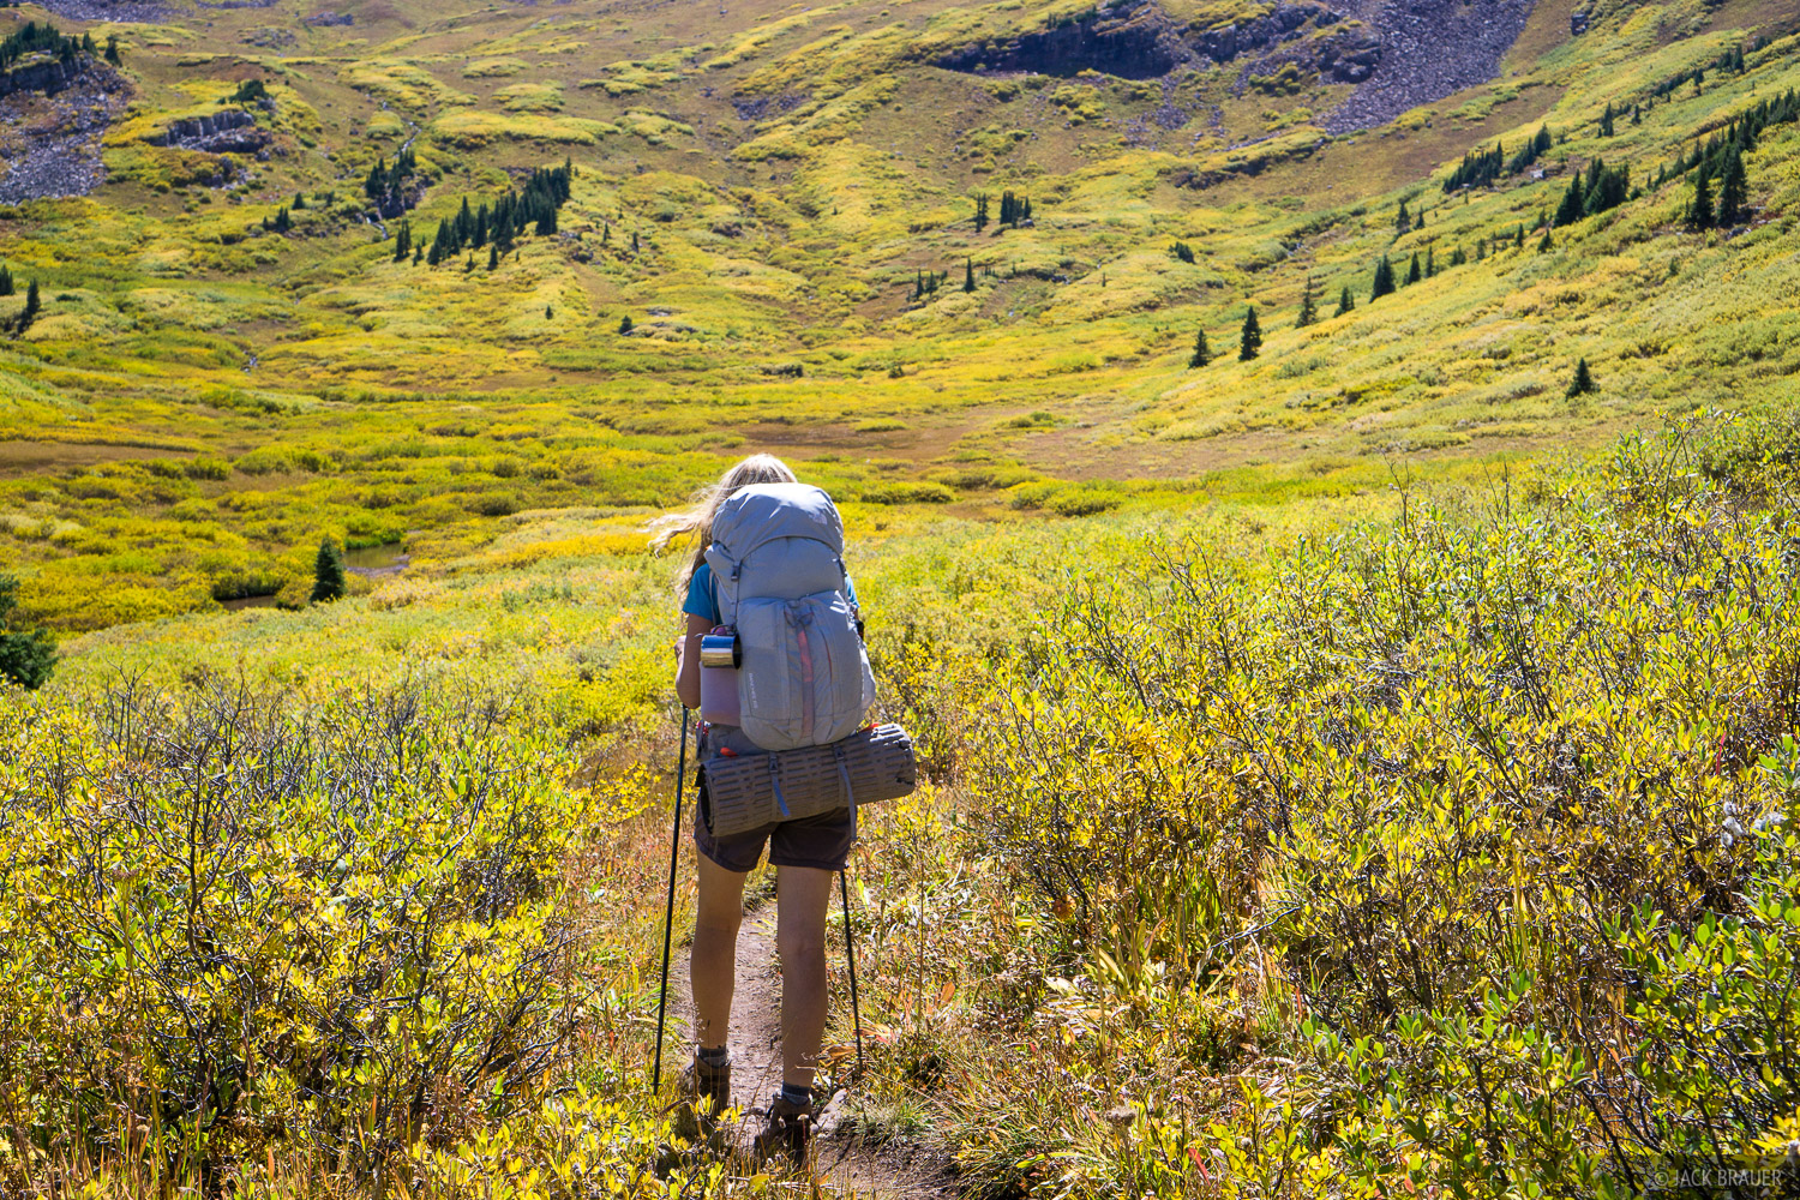 Colorado, Elk Mountains, hiking, Maroon Bells-Snowmass Wilderness, photo